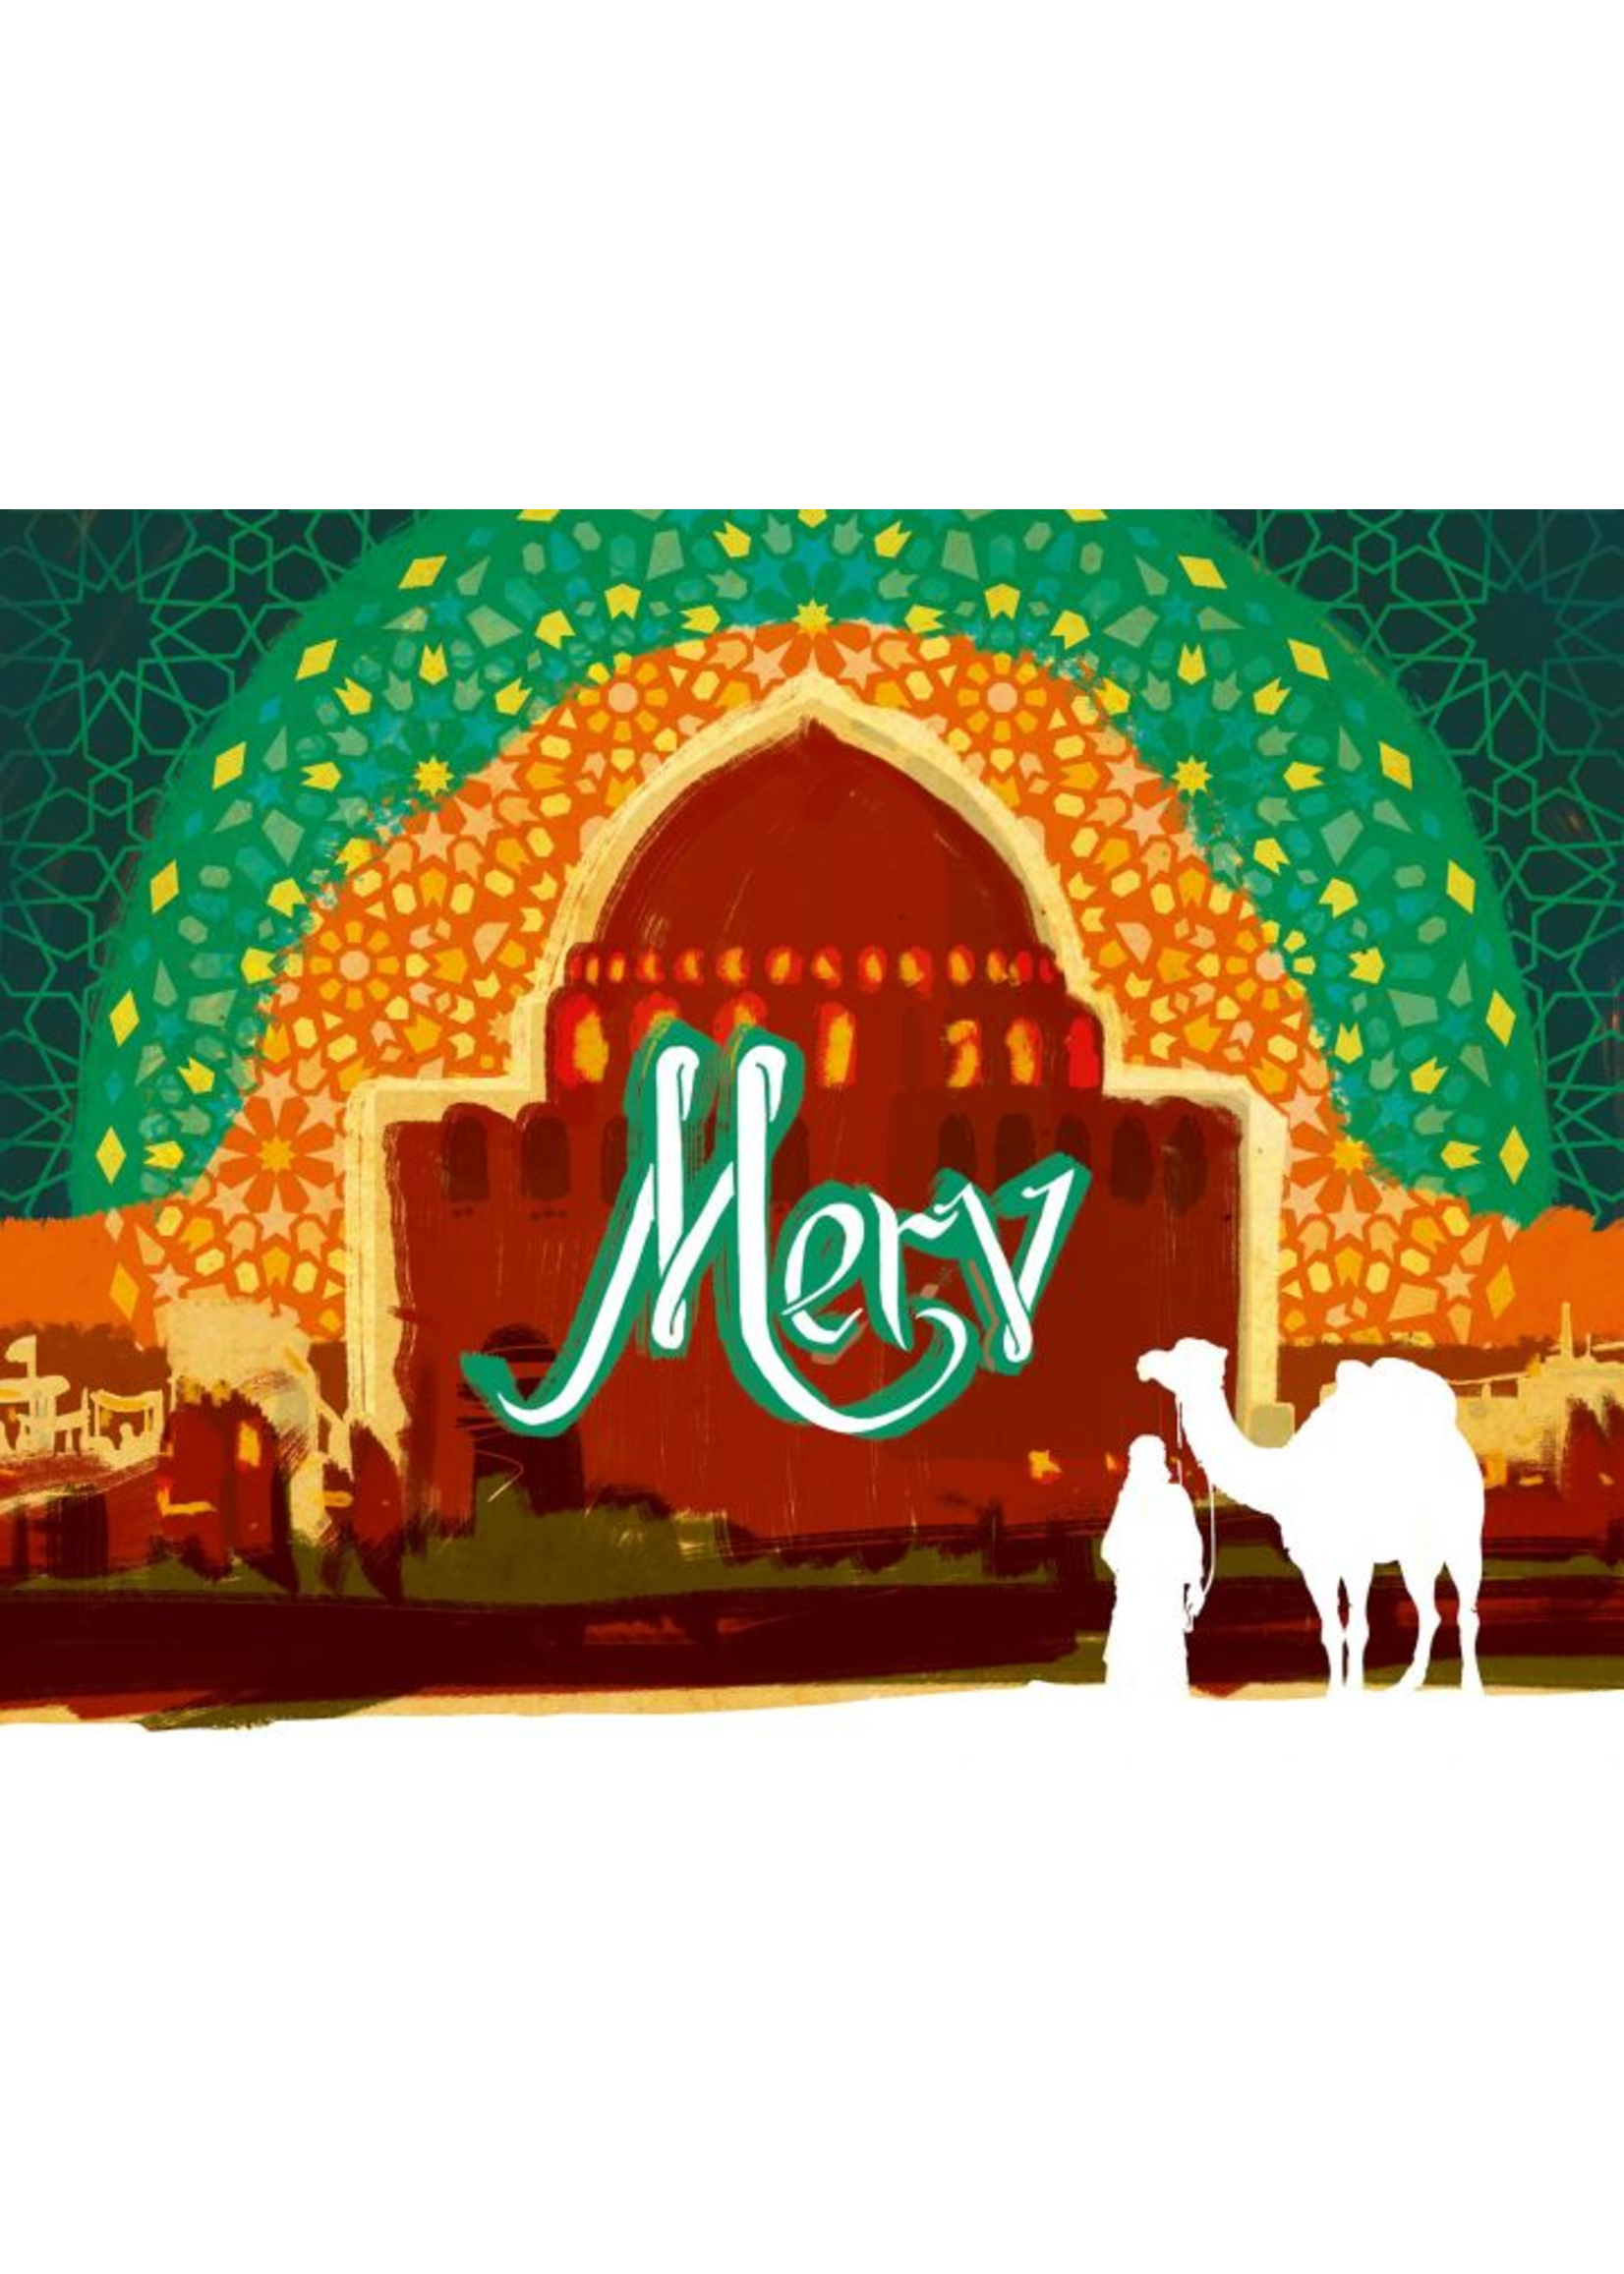 Merv - The Heart Of The Silk Road